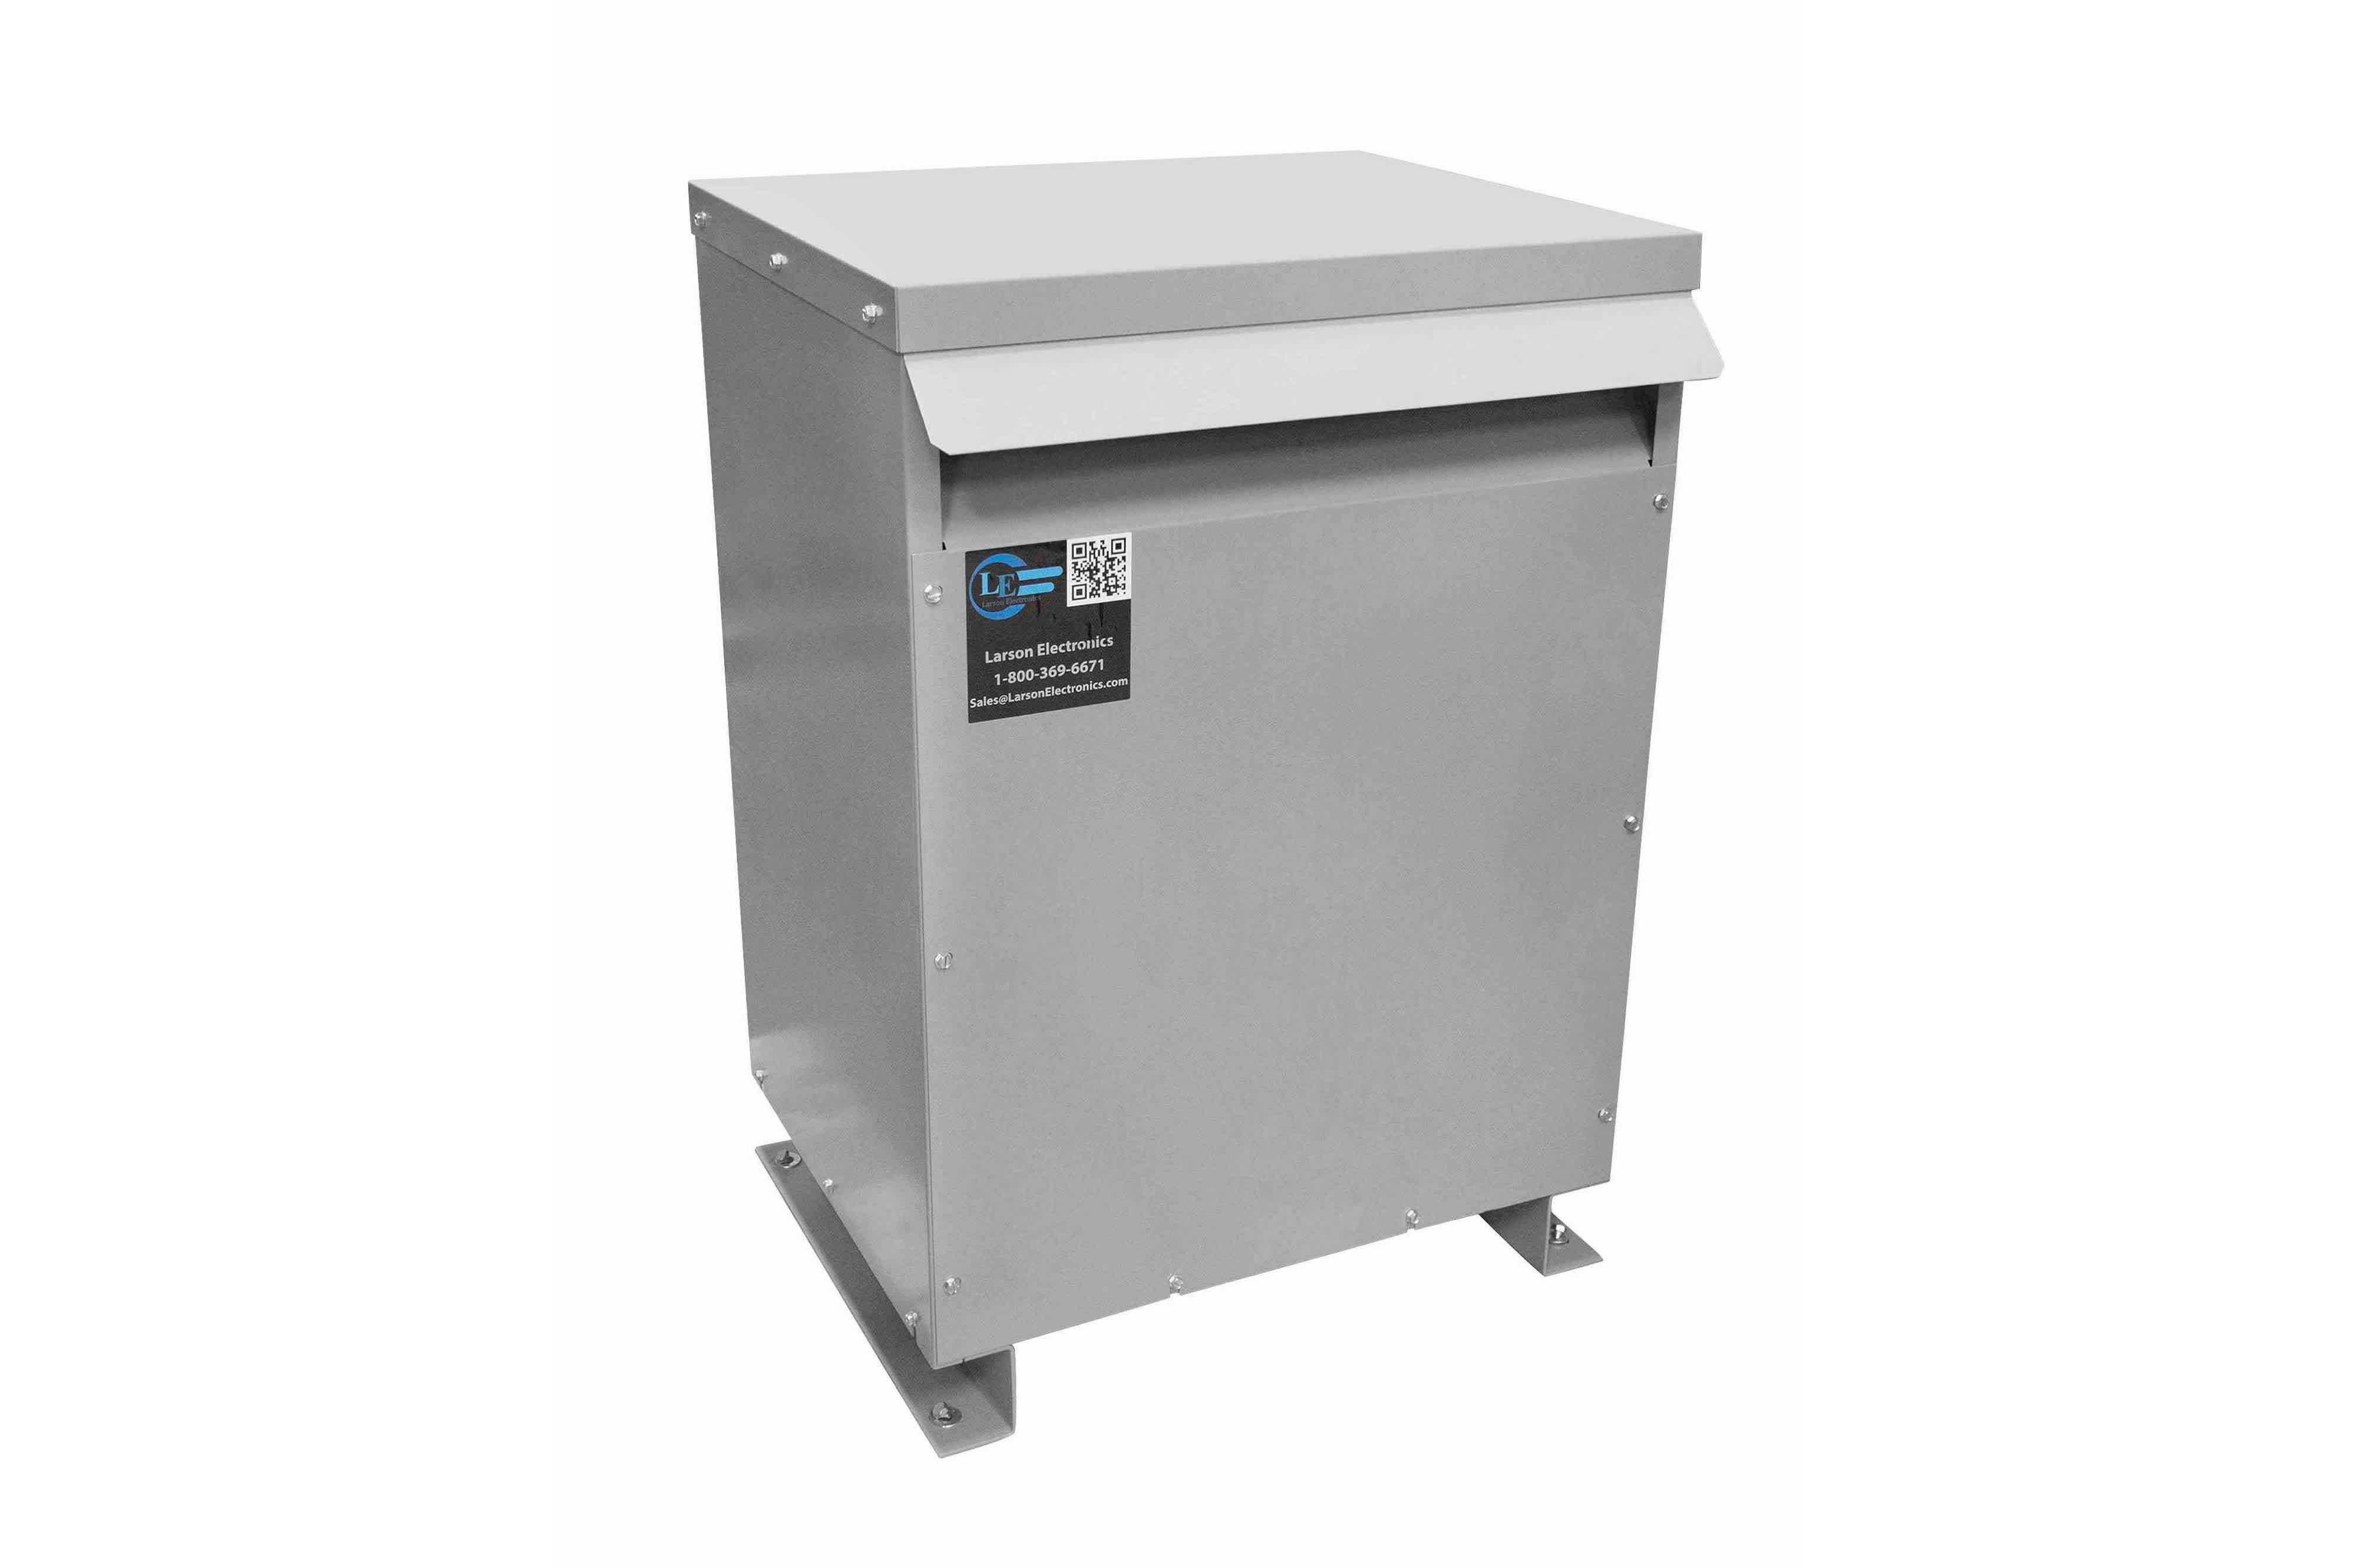 15 kVA 3PH Isolation Transformer, 480V Wye Primary, 415V Delta Secondary, N3R, Ventilated, 60 Hz